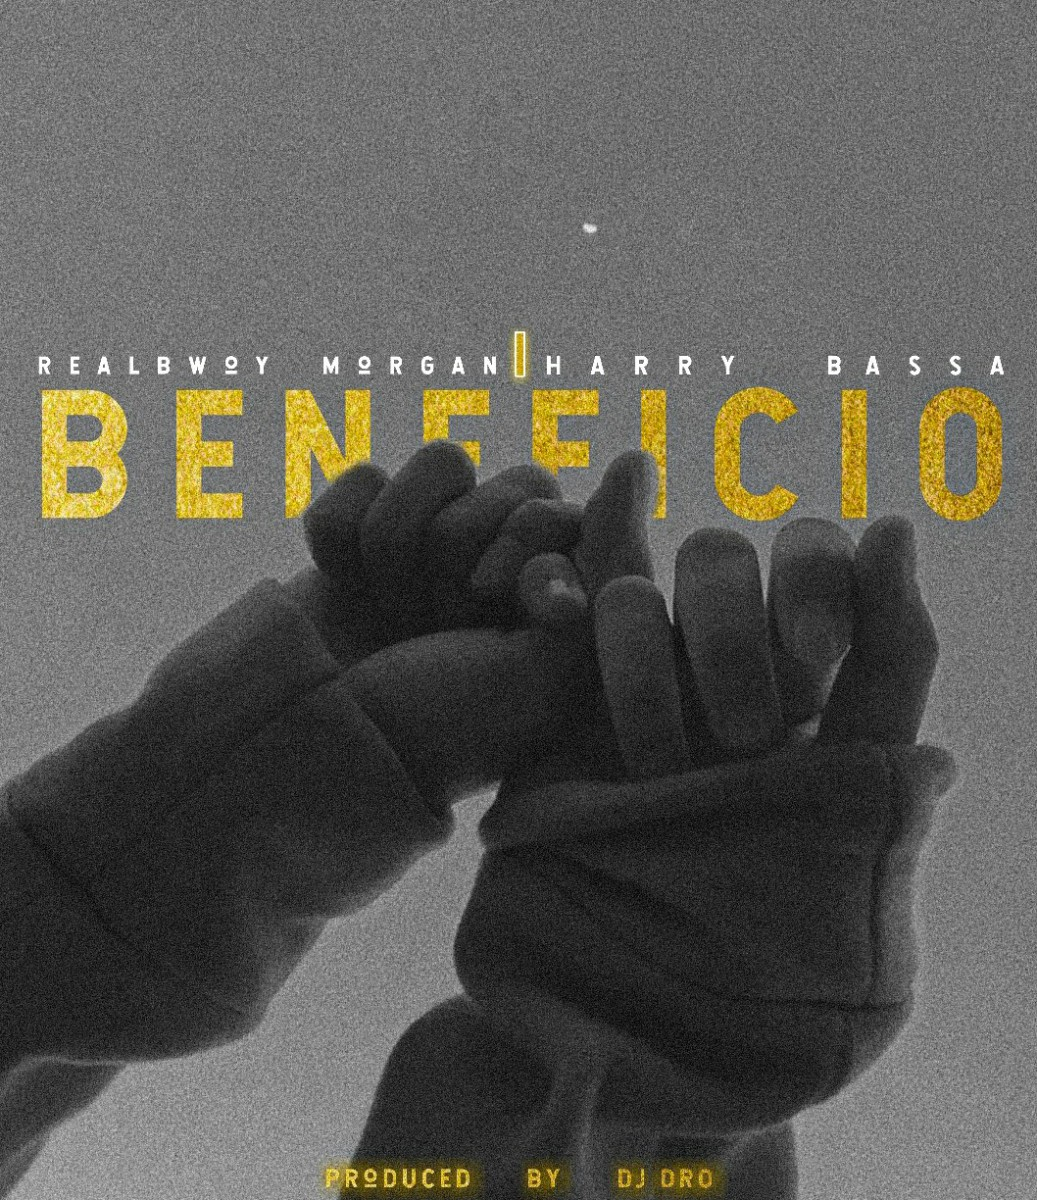 RealBwoy Morgan ft. Harry Bassa - Beneficio (Prod. DJ Dro)